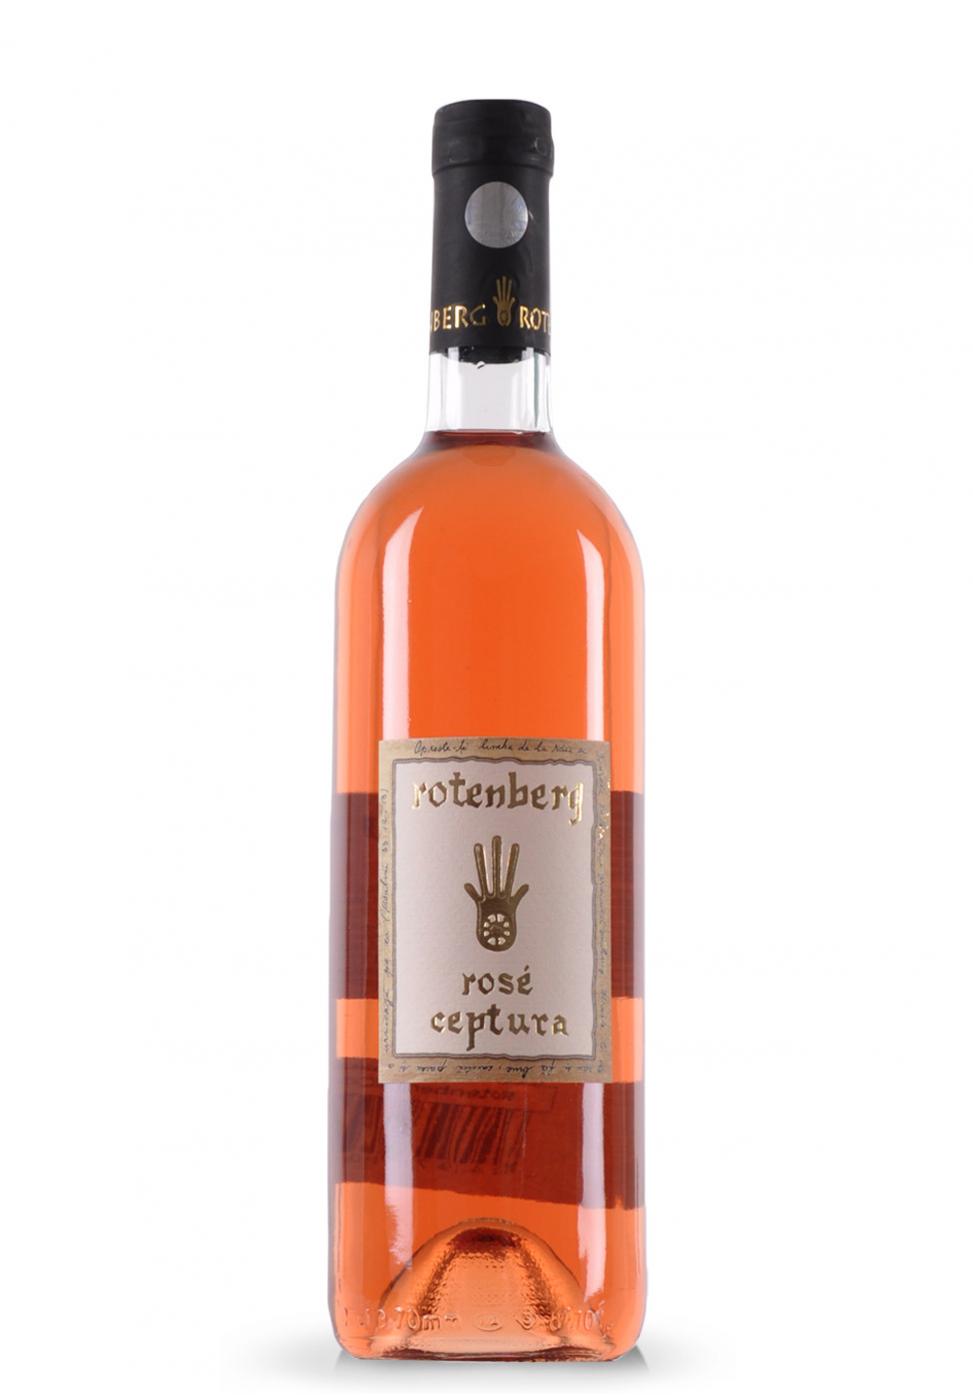 Vin Merlot Rotenberg Rose, Ceptura 2015 (0.75L)